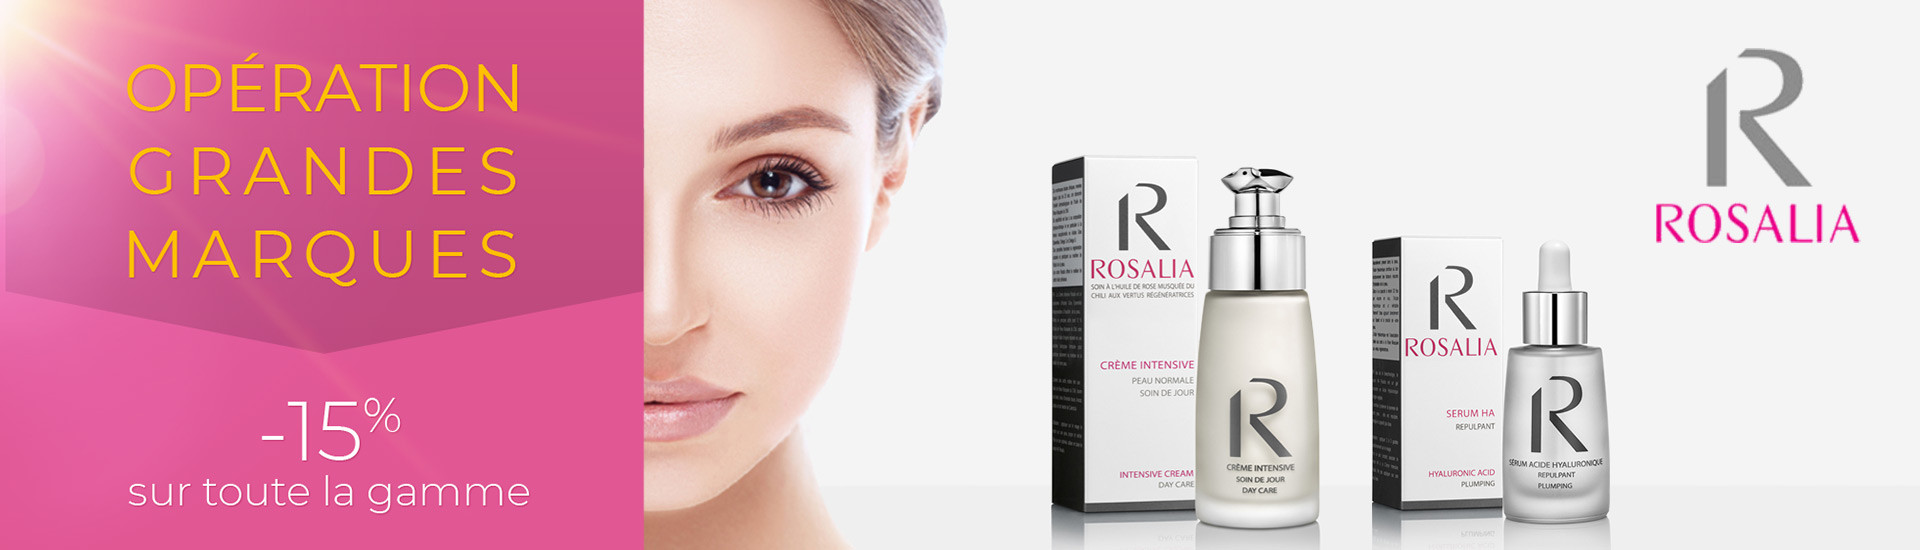 OPERATION GRANDES MARQUES - 15% sur la gamme Rosalia